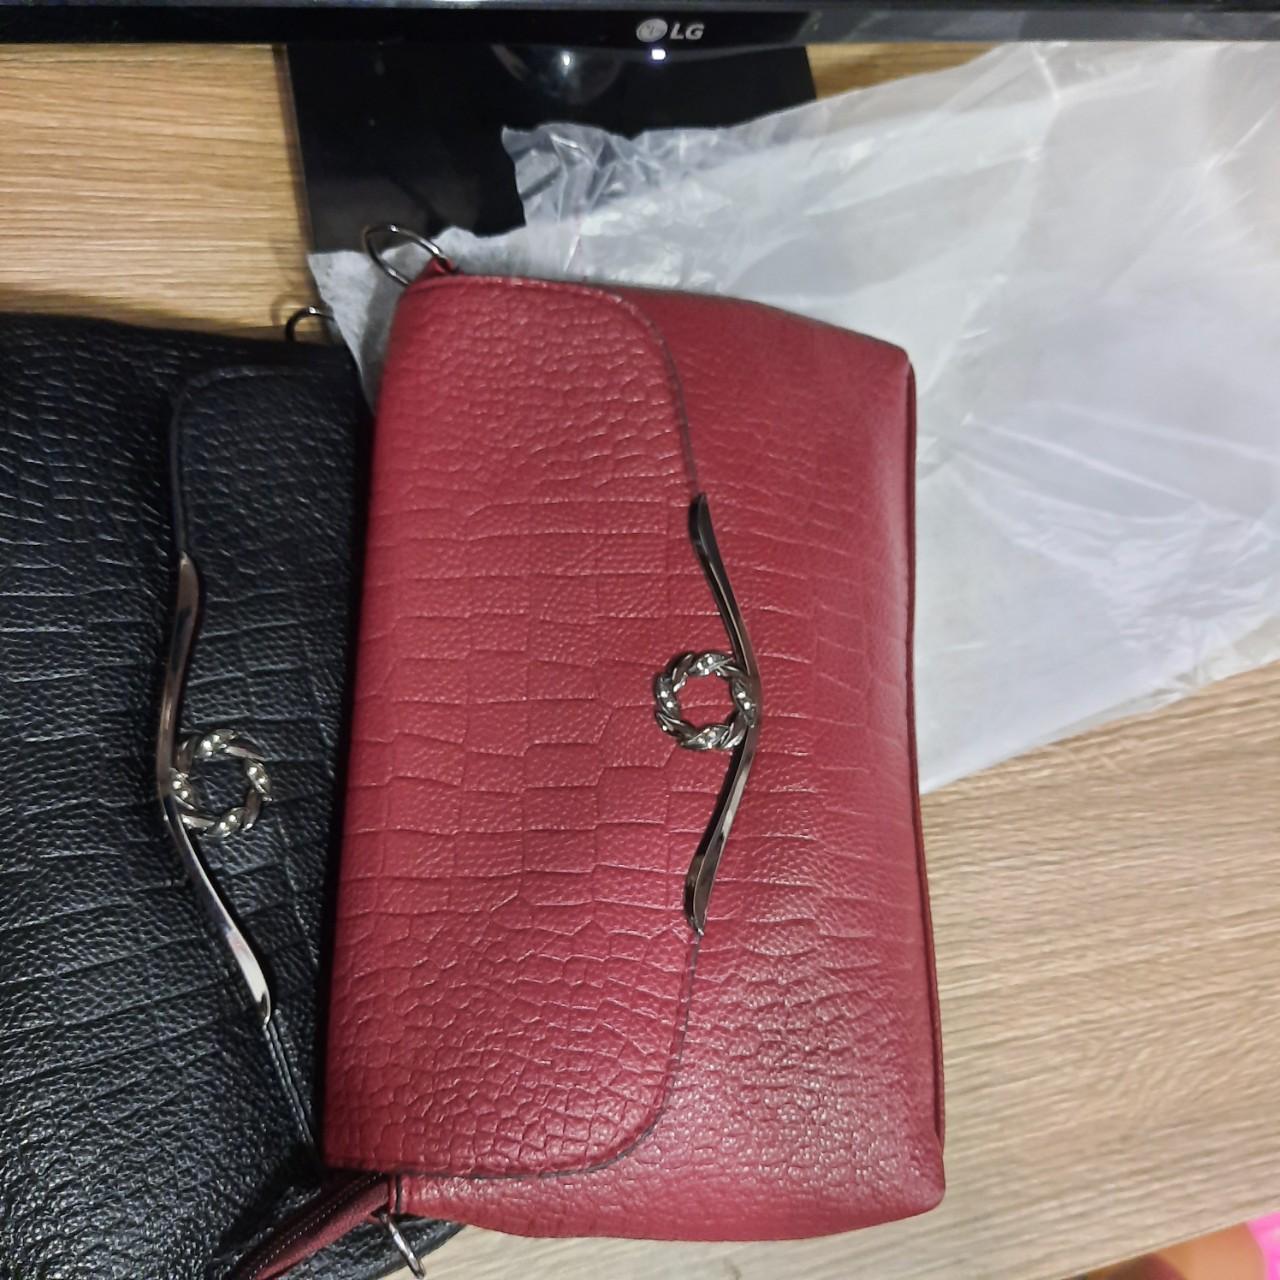 Túi đeo chéo vai da nữ da rạn có nẹp cao cấp SK90 Shalla(túi đeo chéo da nữ nguồn sỉ)